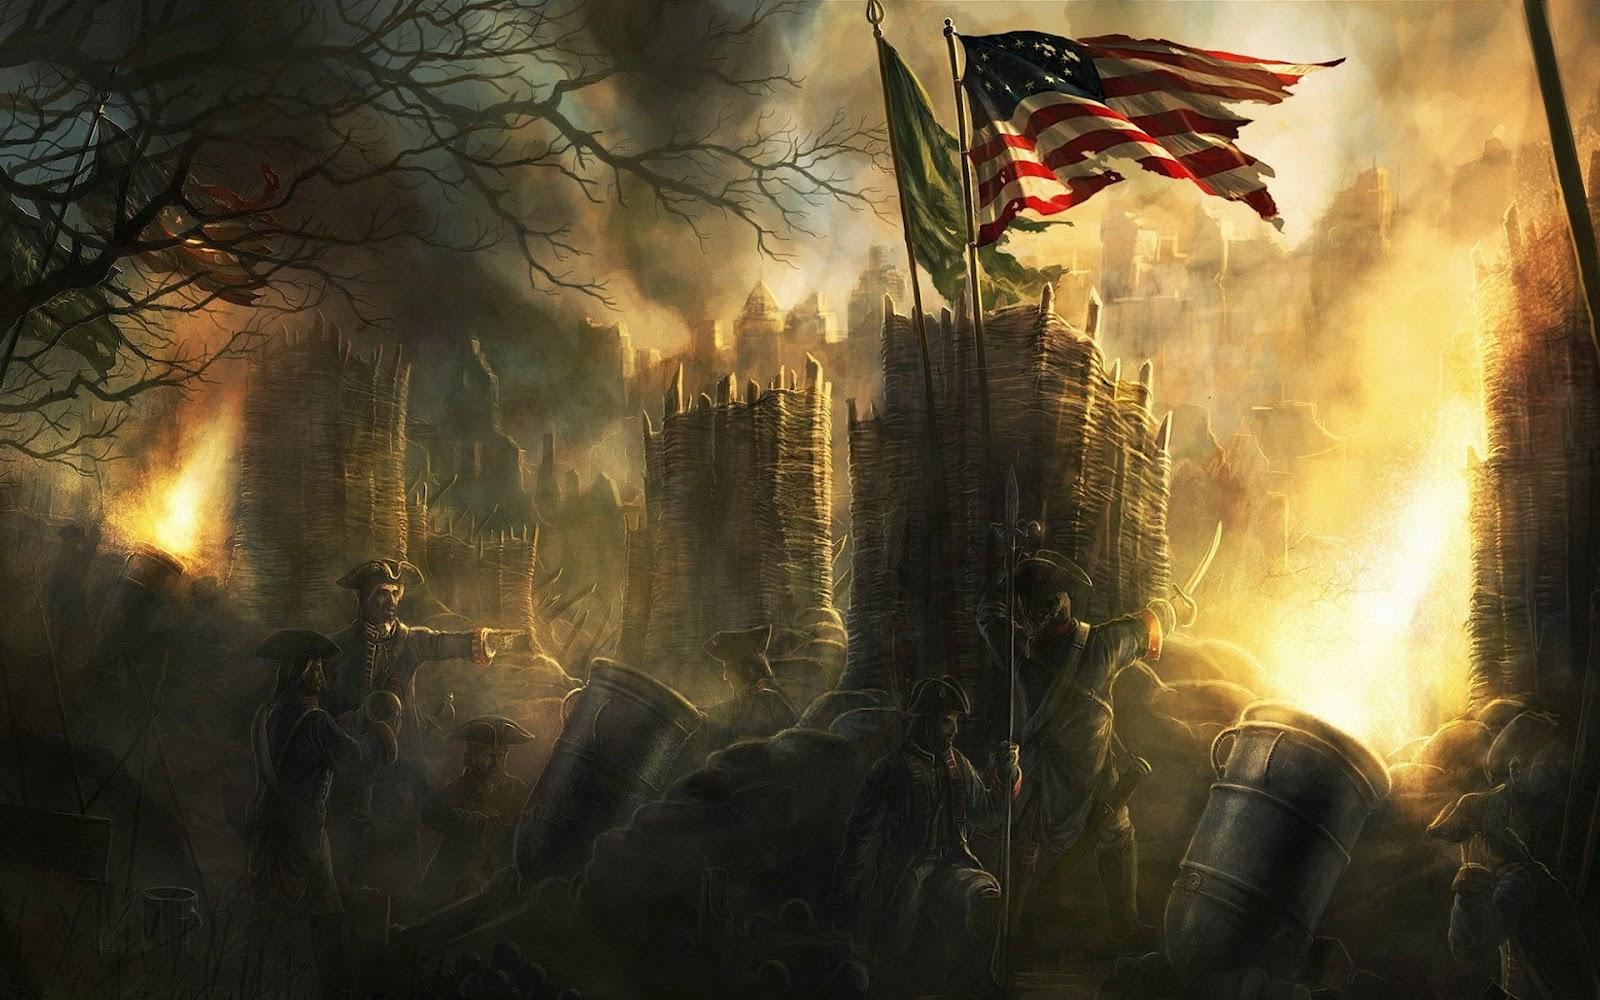 http://2.bp.blogspot.com/-s-ndVkQRvZE/T92Z7sGc-rI/AAAAAAAADYY/RYDub-mmTF8/s1600/Empire+Total+War+HD+Wallpapers+%25286%2529.jpg